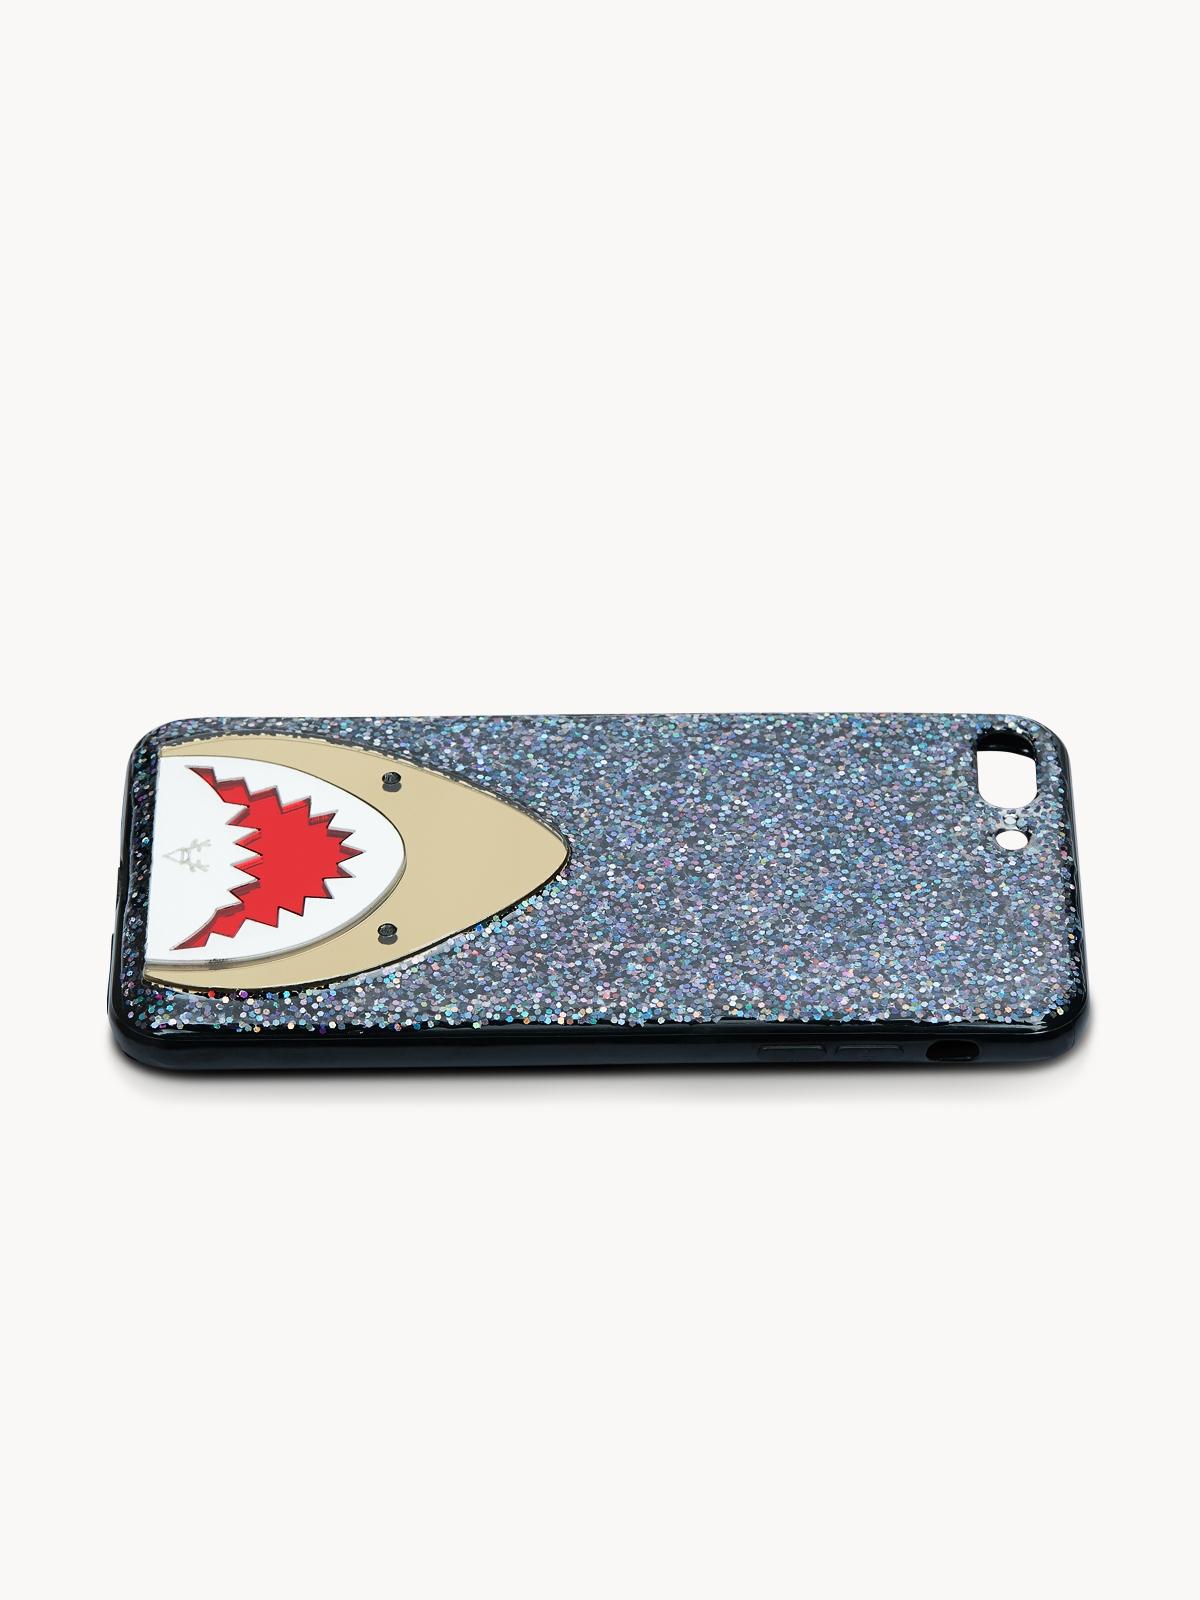 Reindeer Shark iPhone 7Plus8Plus Case Black